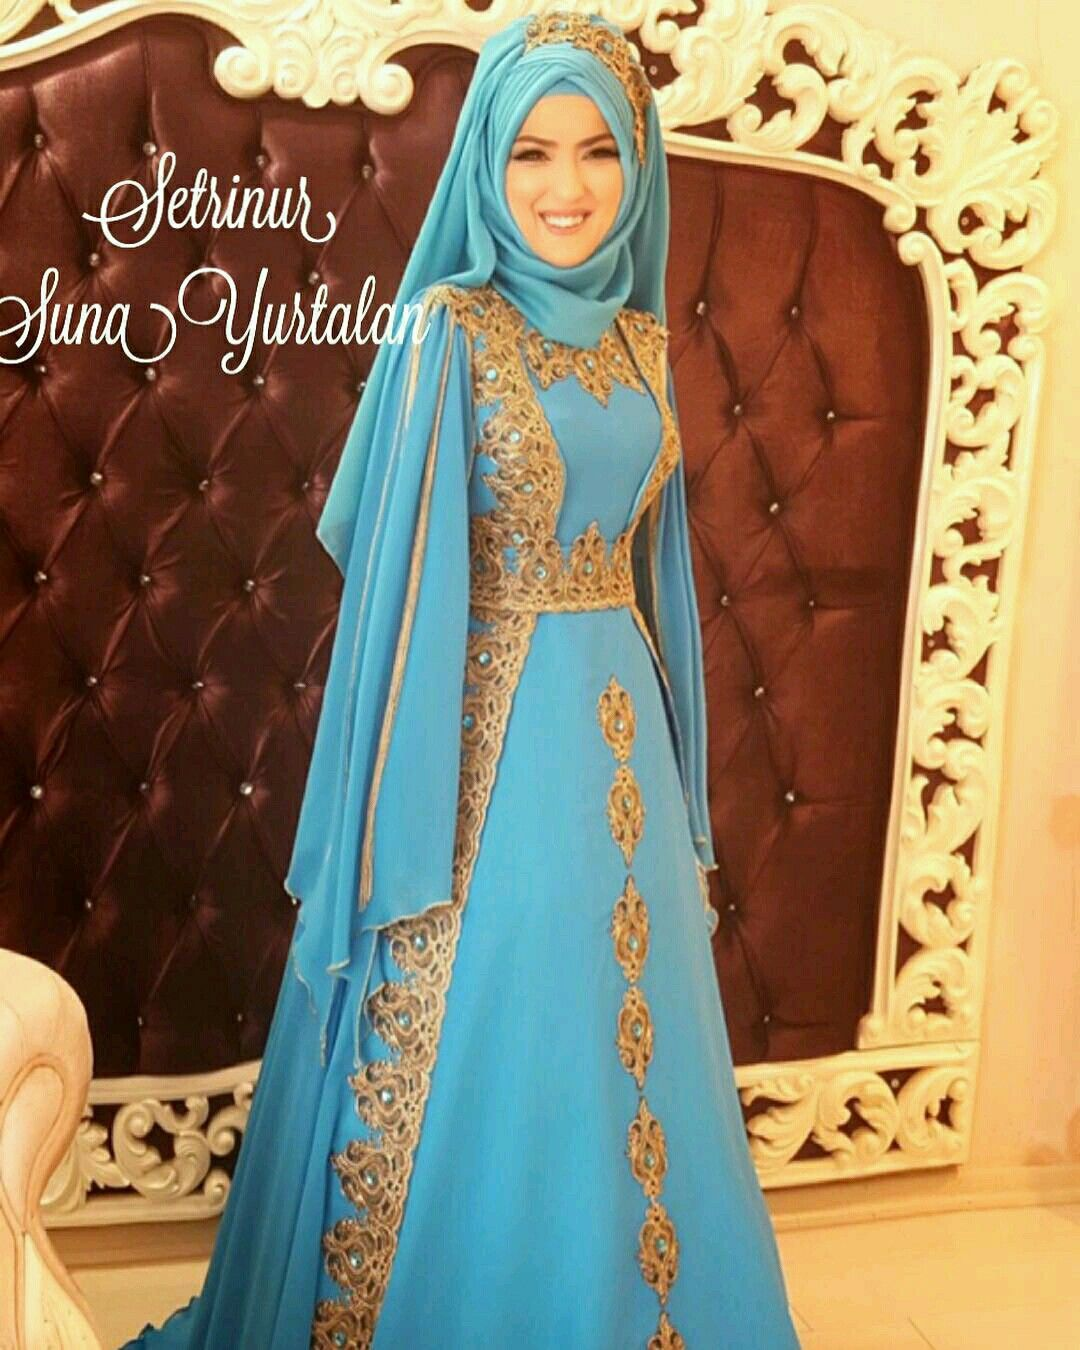 Pin by Omnia Ali on Dress patterns | Pinterest | Dress patterns